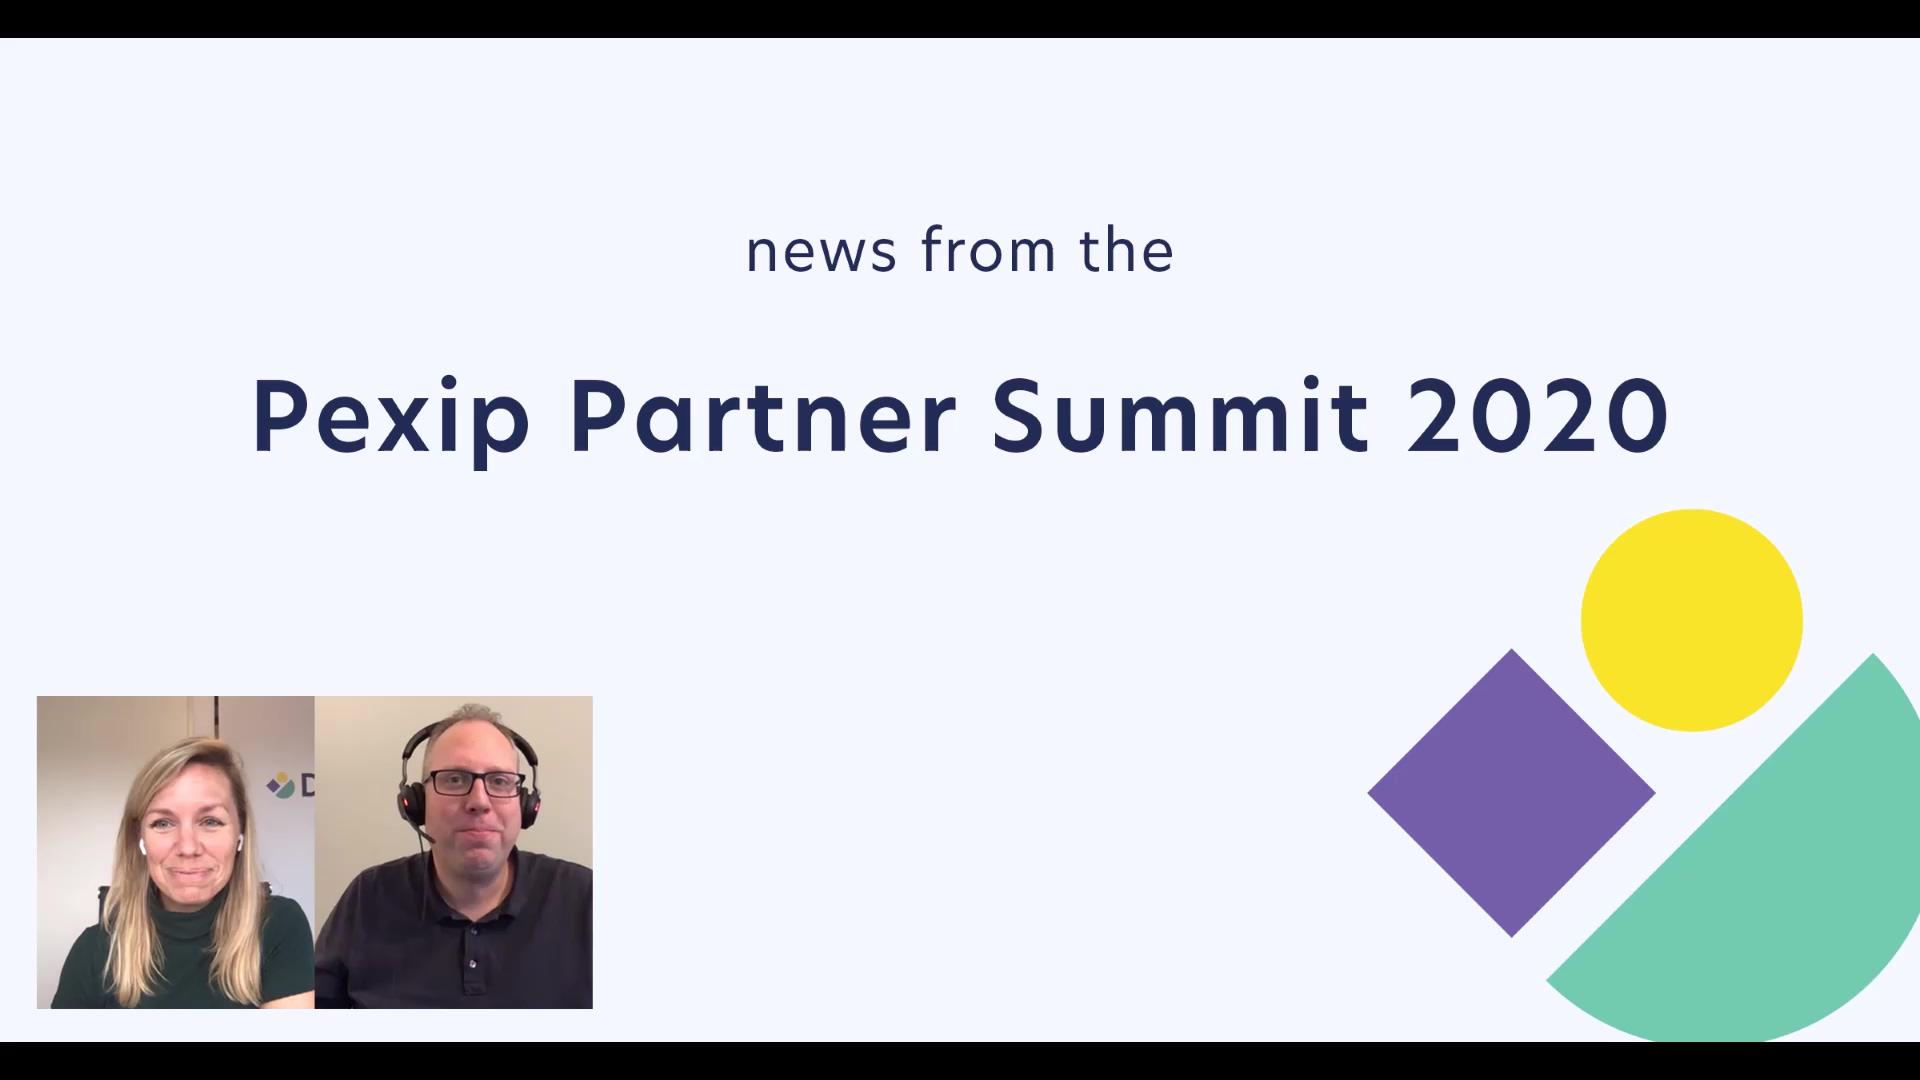 Recap Pexip Partner Summit 2020